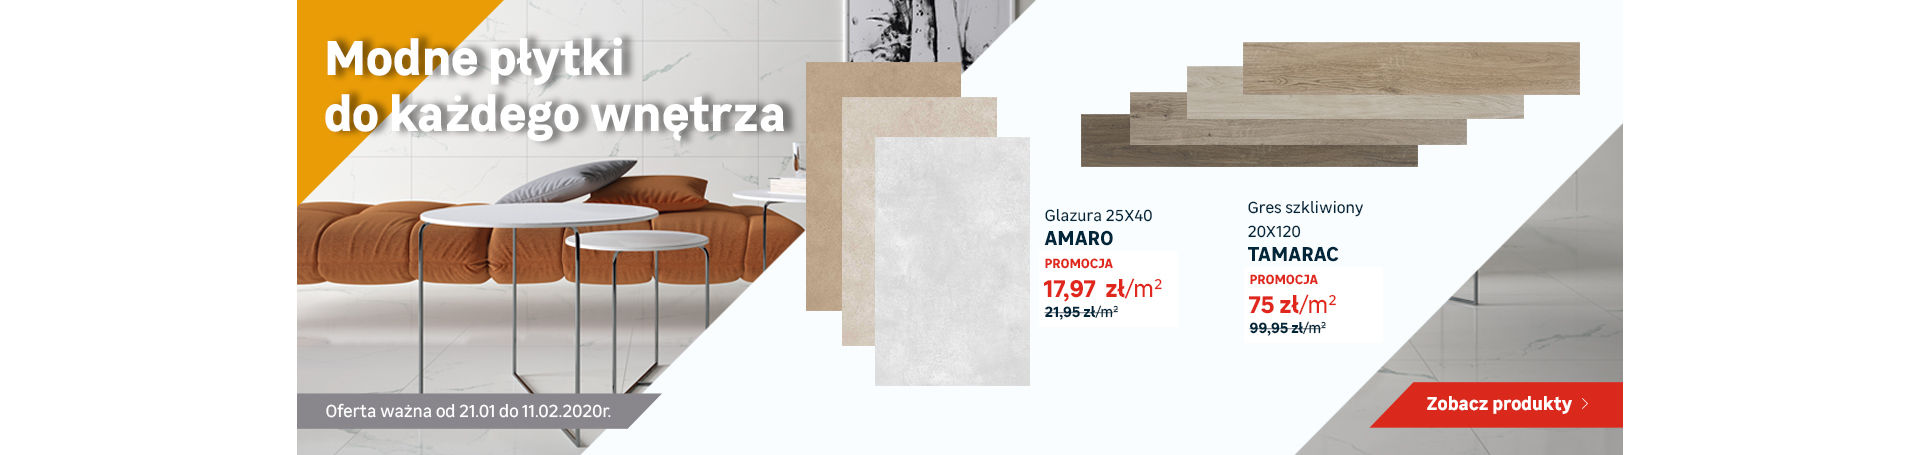 ps-glazura-gres-21.01-11.02.2020-1323x455